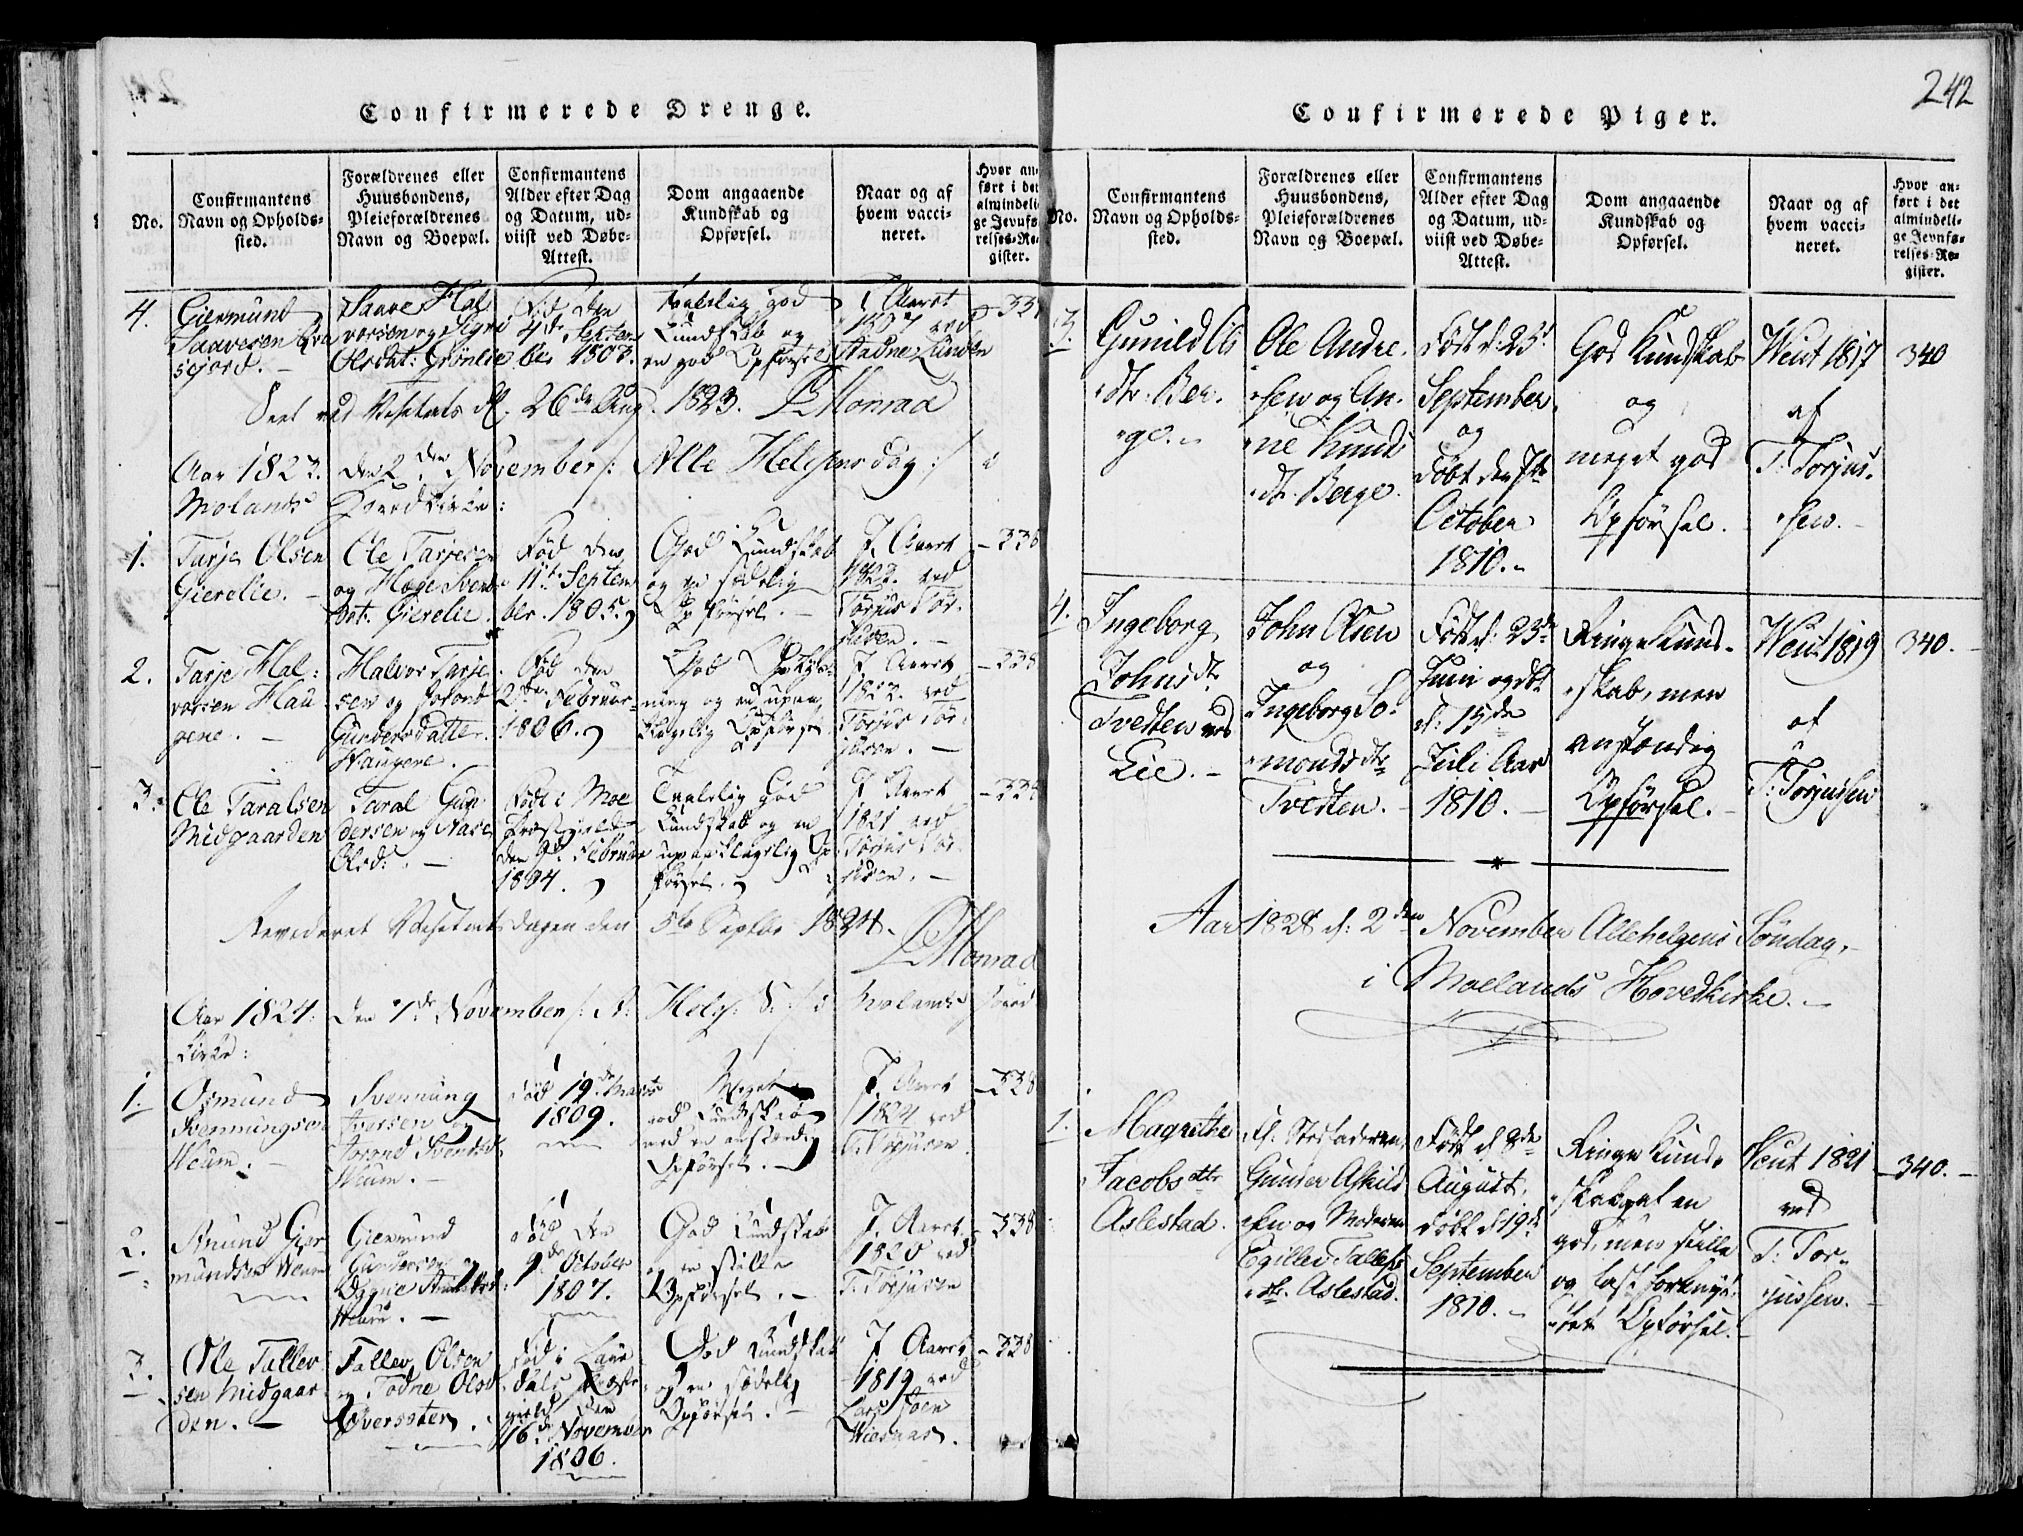 SAKO, Fyresdal kirkebøker, F/Fb/L0001: Ministerialbok nr. II 1, 1815-1854, s. 242